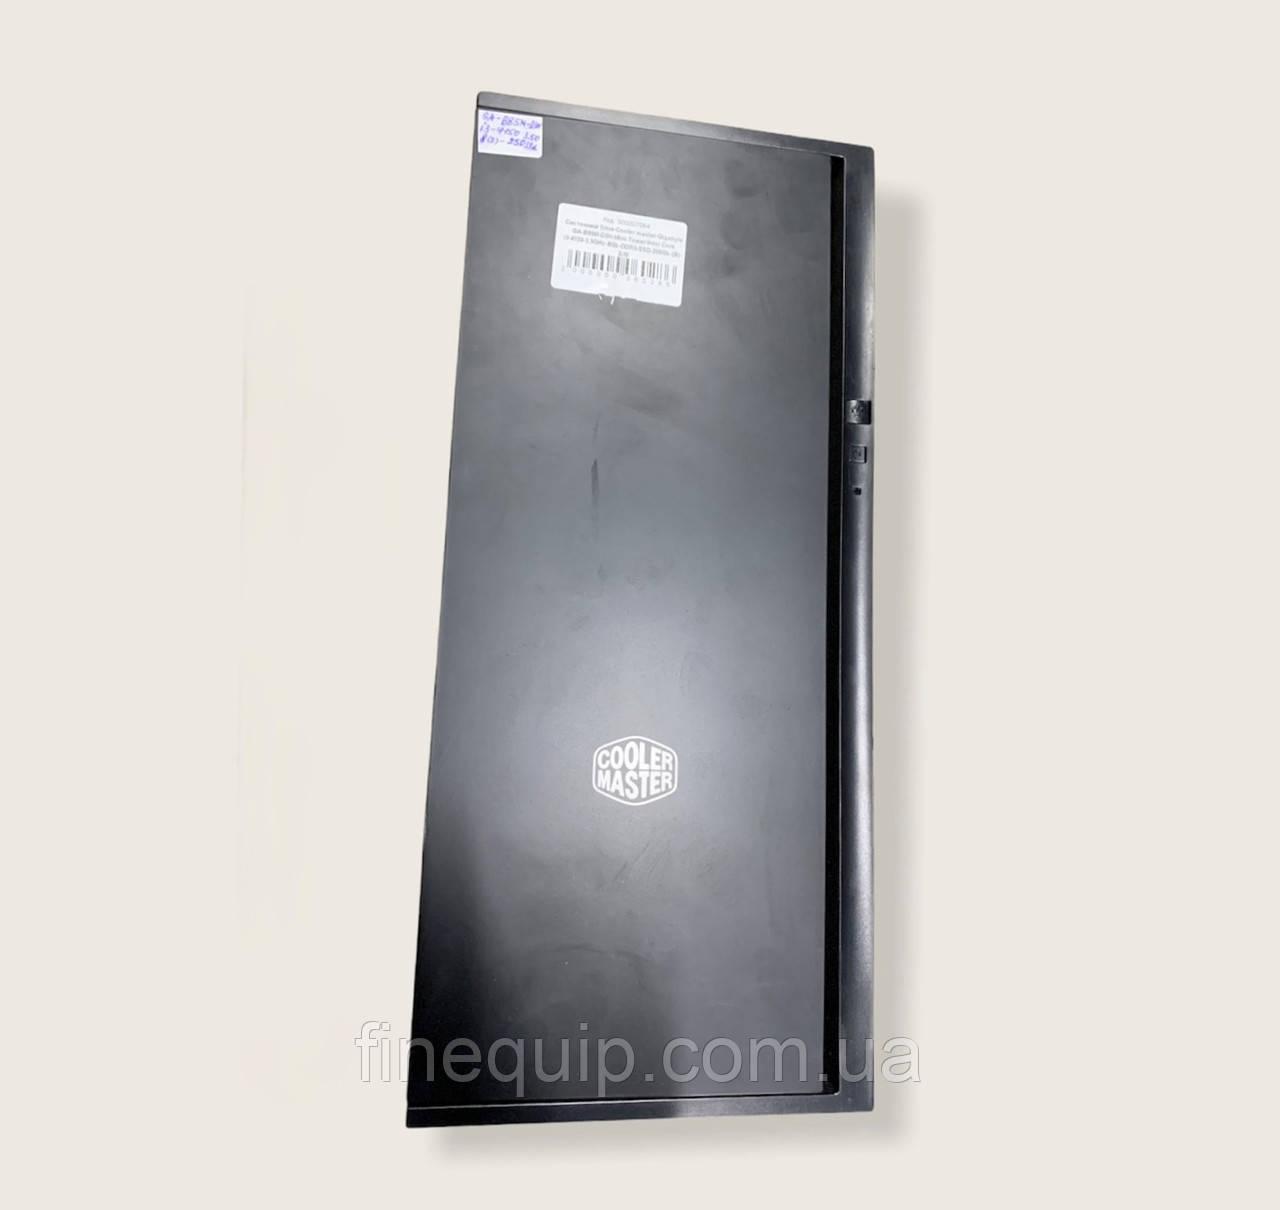 Системний блок-Cooler master-Gigabyte GA-B85M-D3H-Mini-Tower-Intel Core i3-4150-3,5GHz-8Gb-DDR3-SSD-250Gb-(B)-